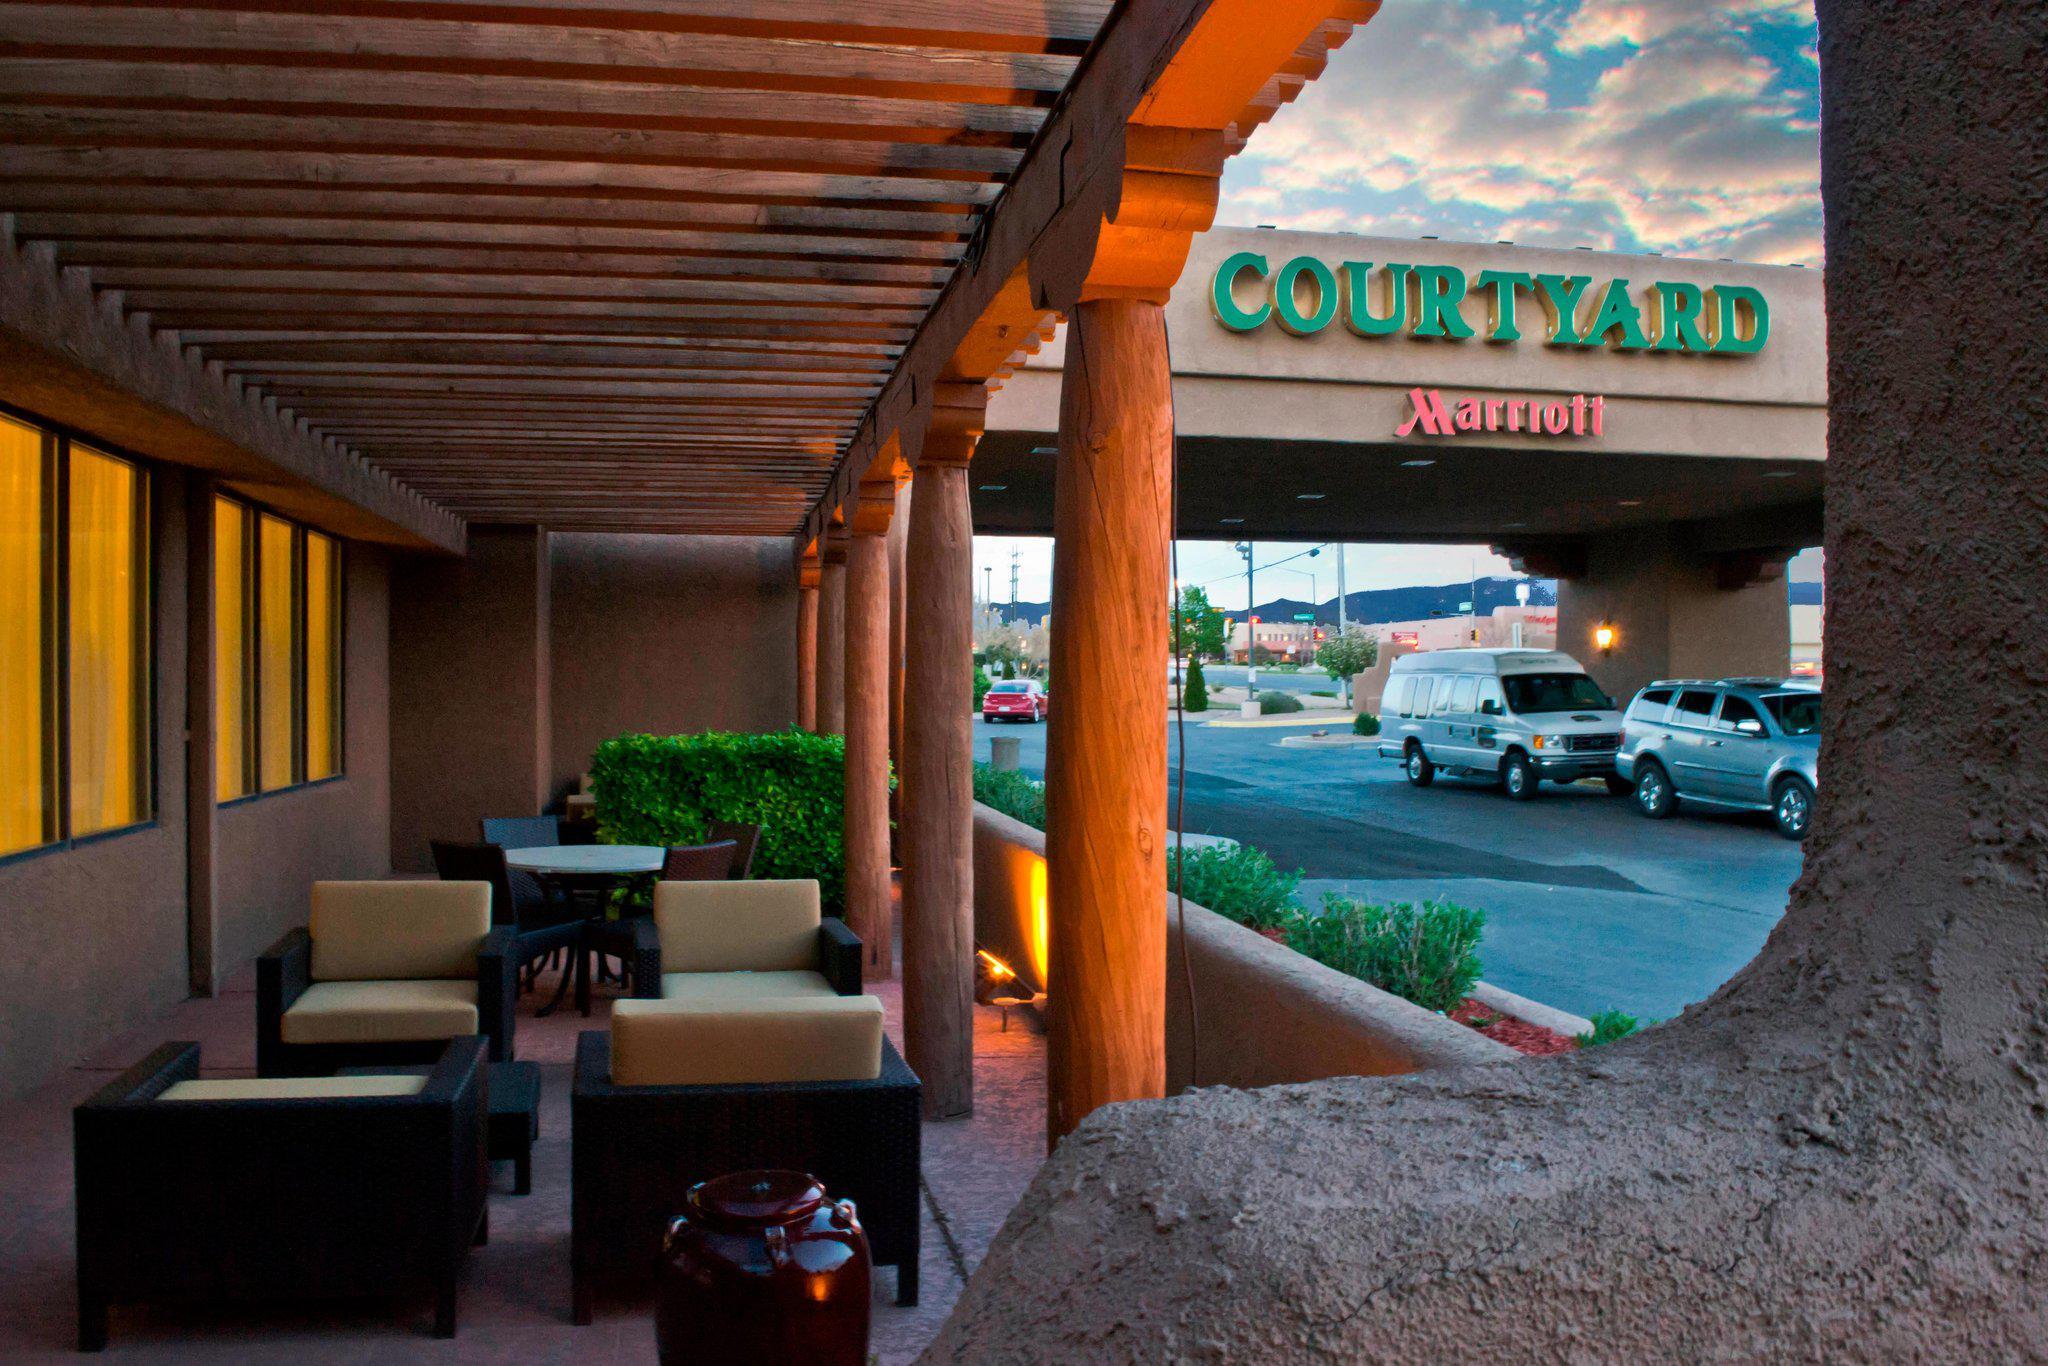 Courtyard by Marriott Santa Fe